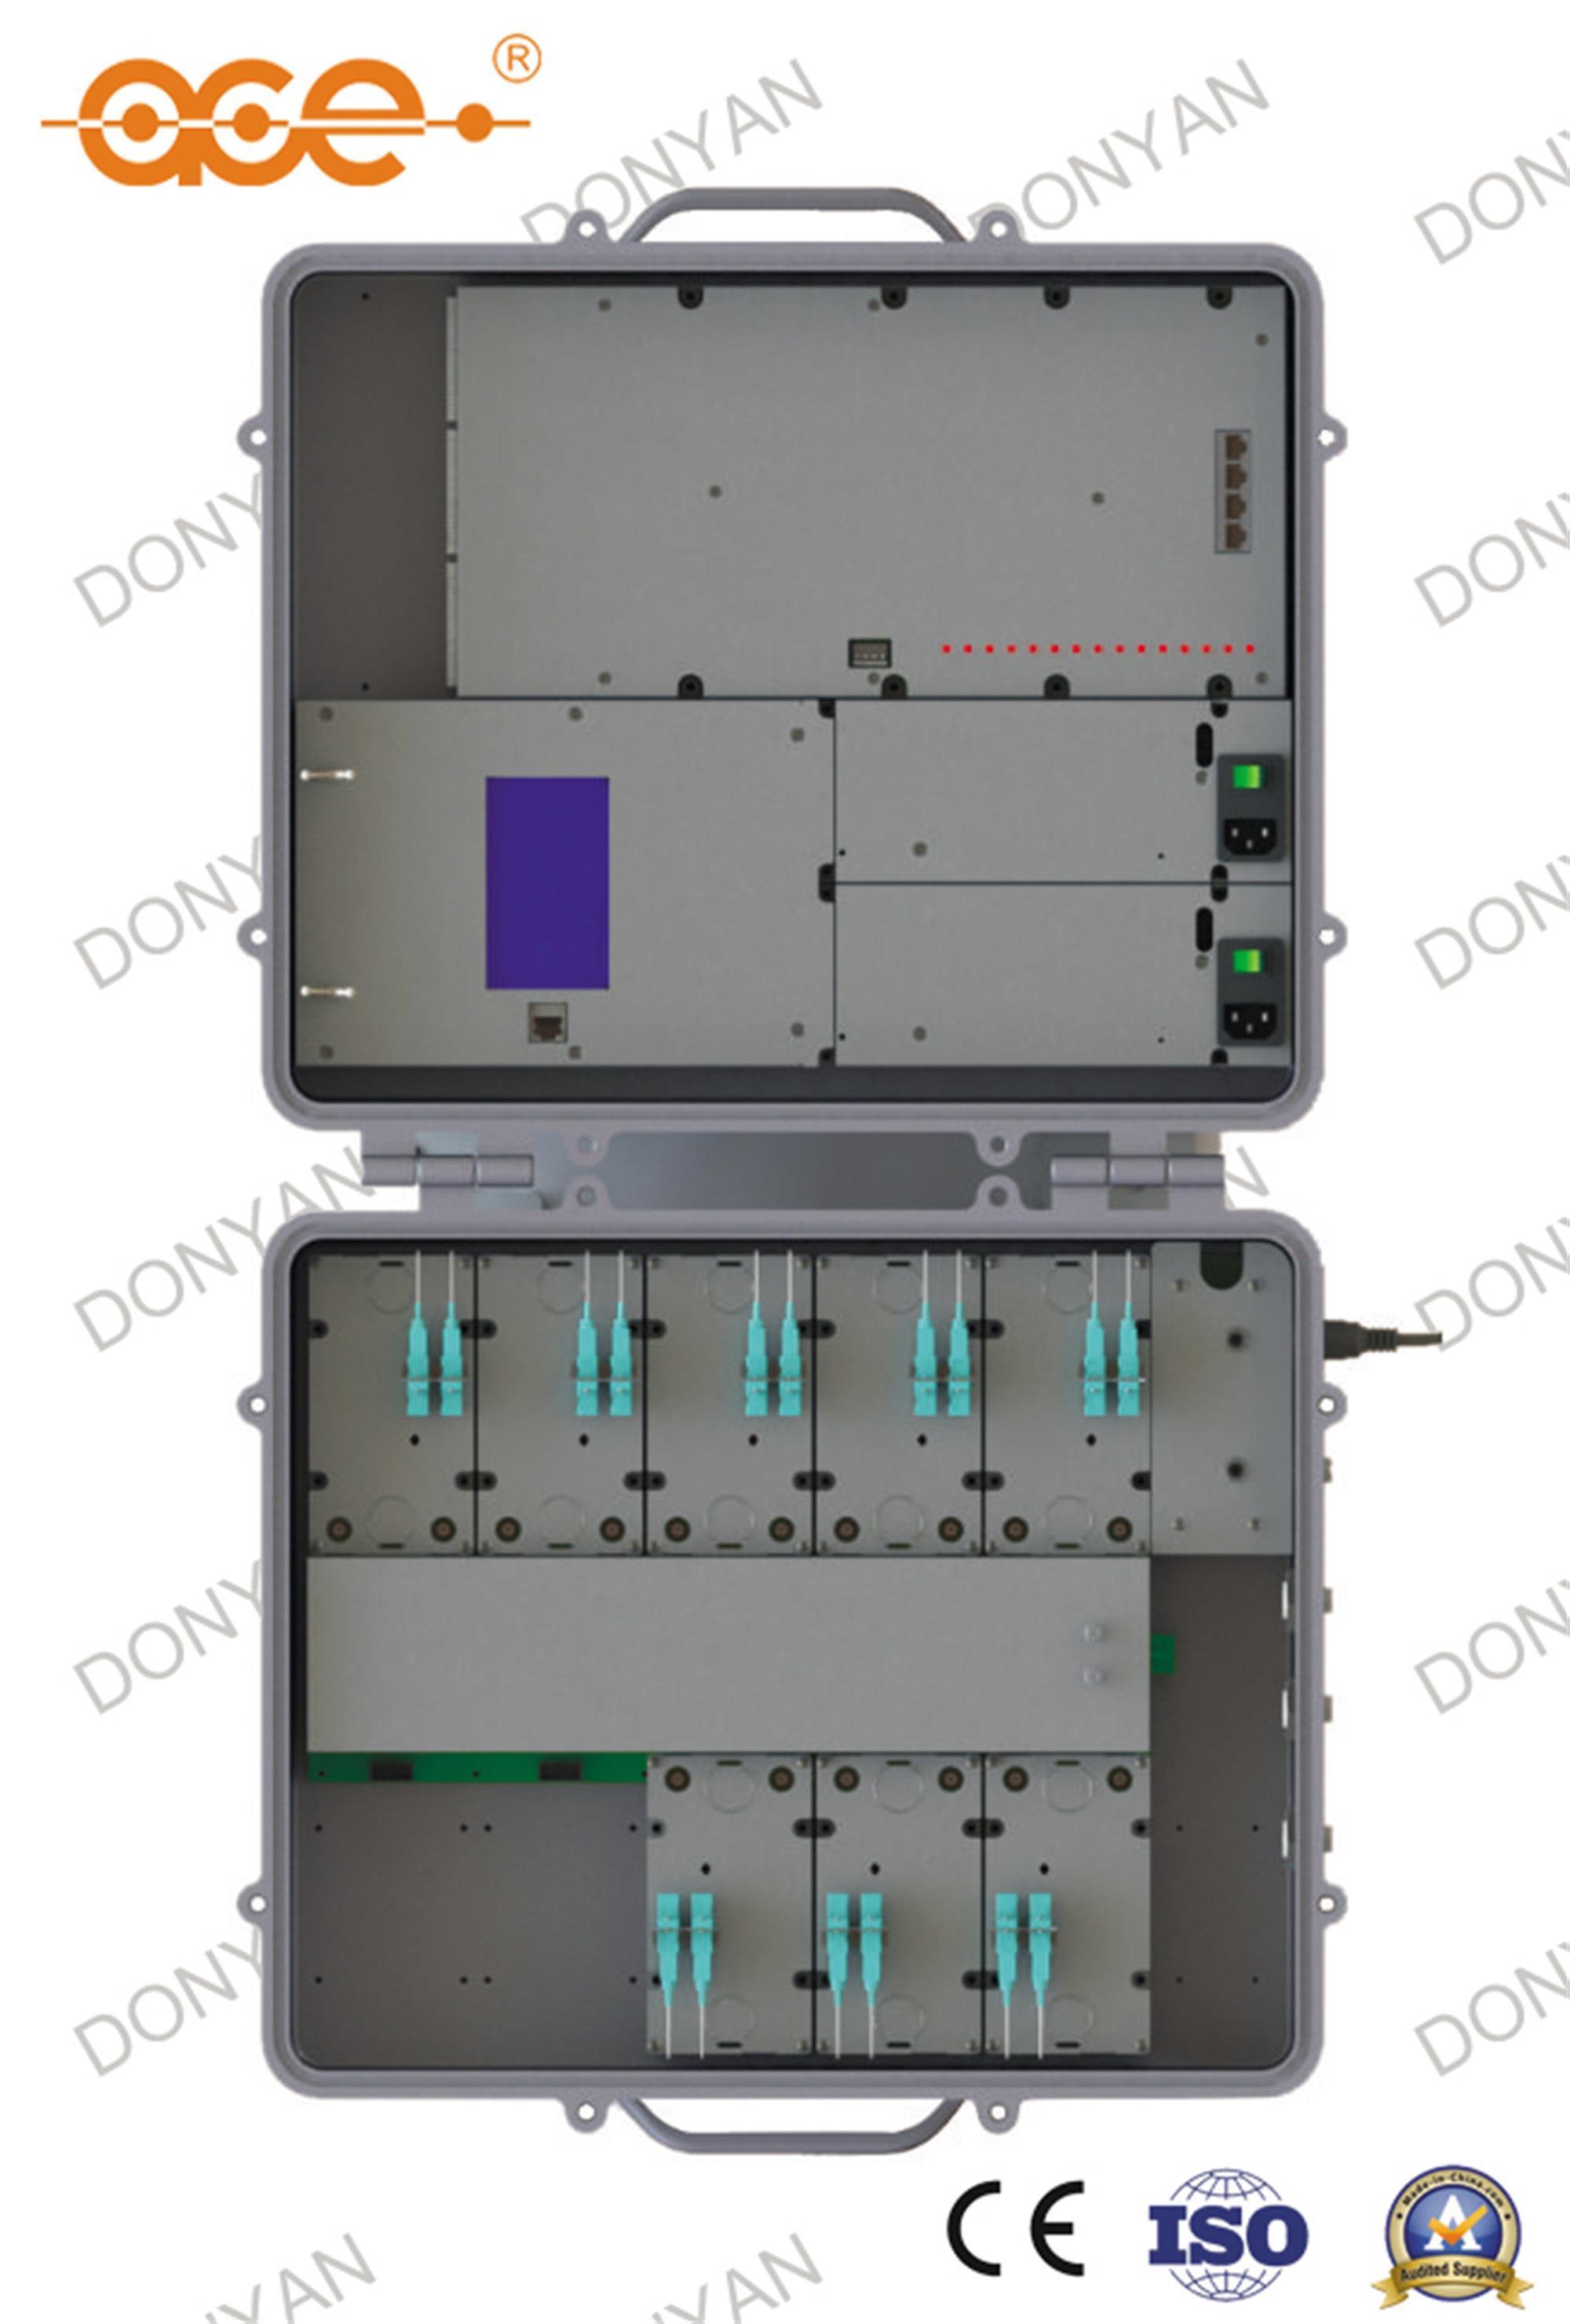 Vhe-03 Epon Outdoor Olt Virtual Headend for CATV FTTH Network